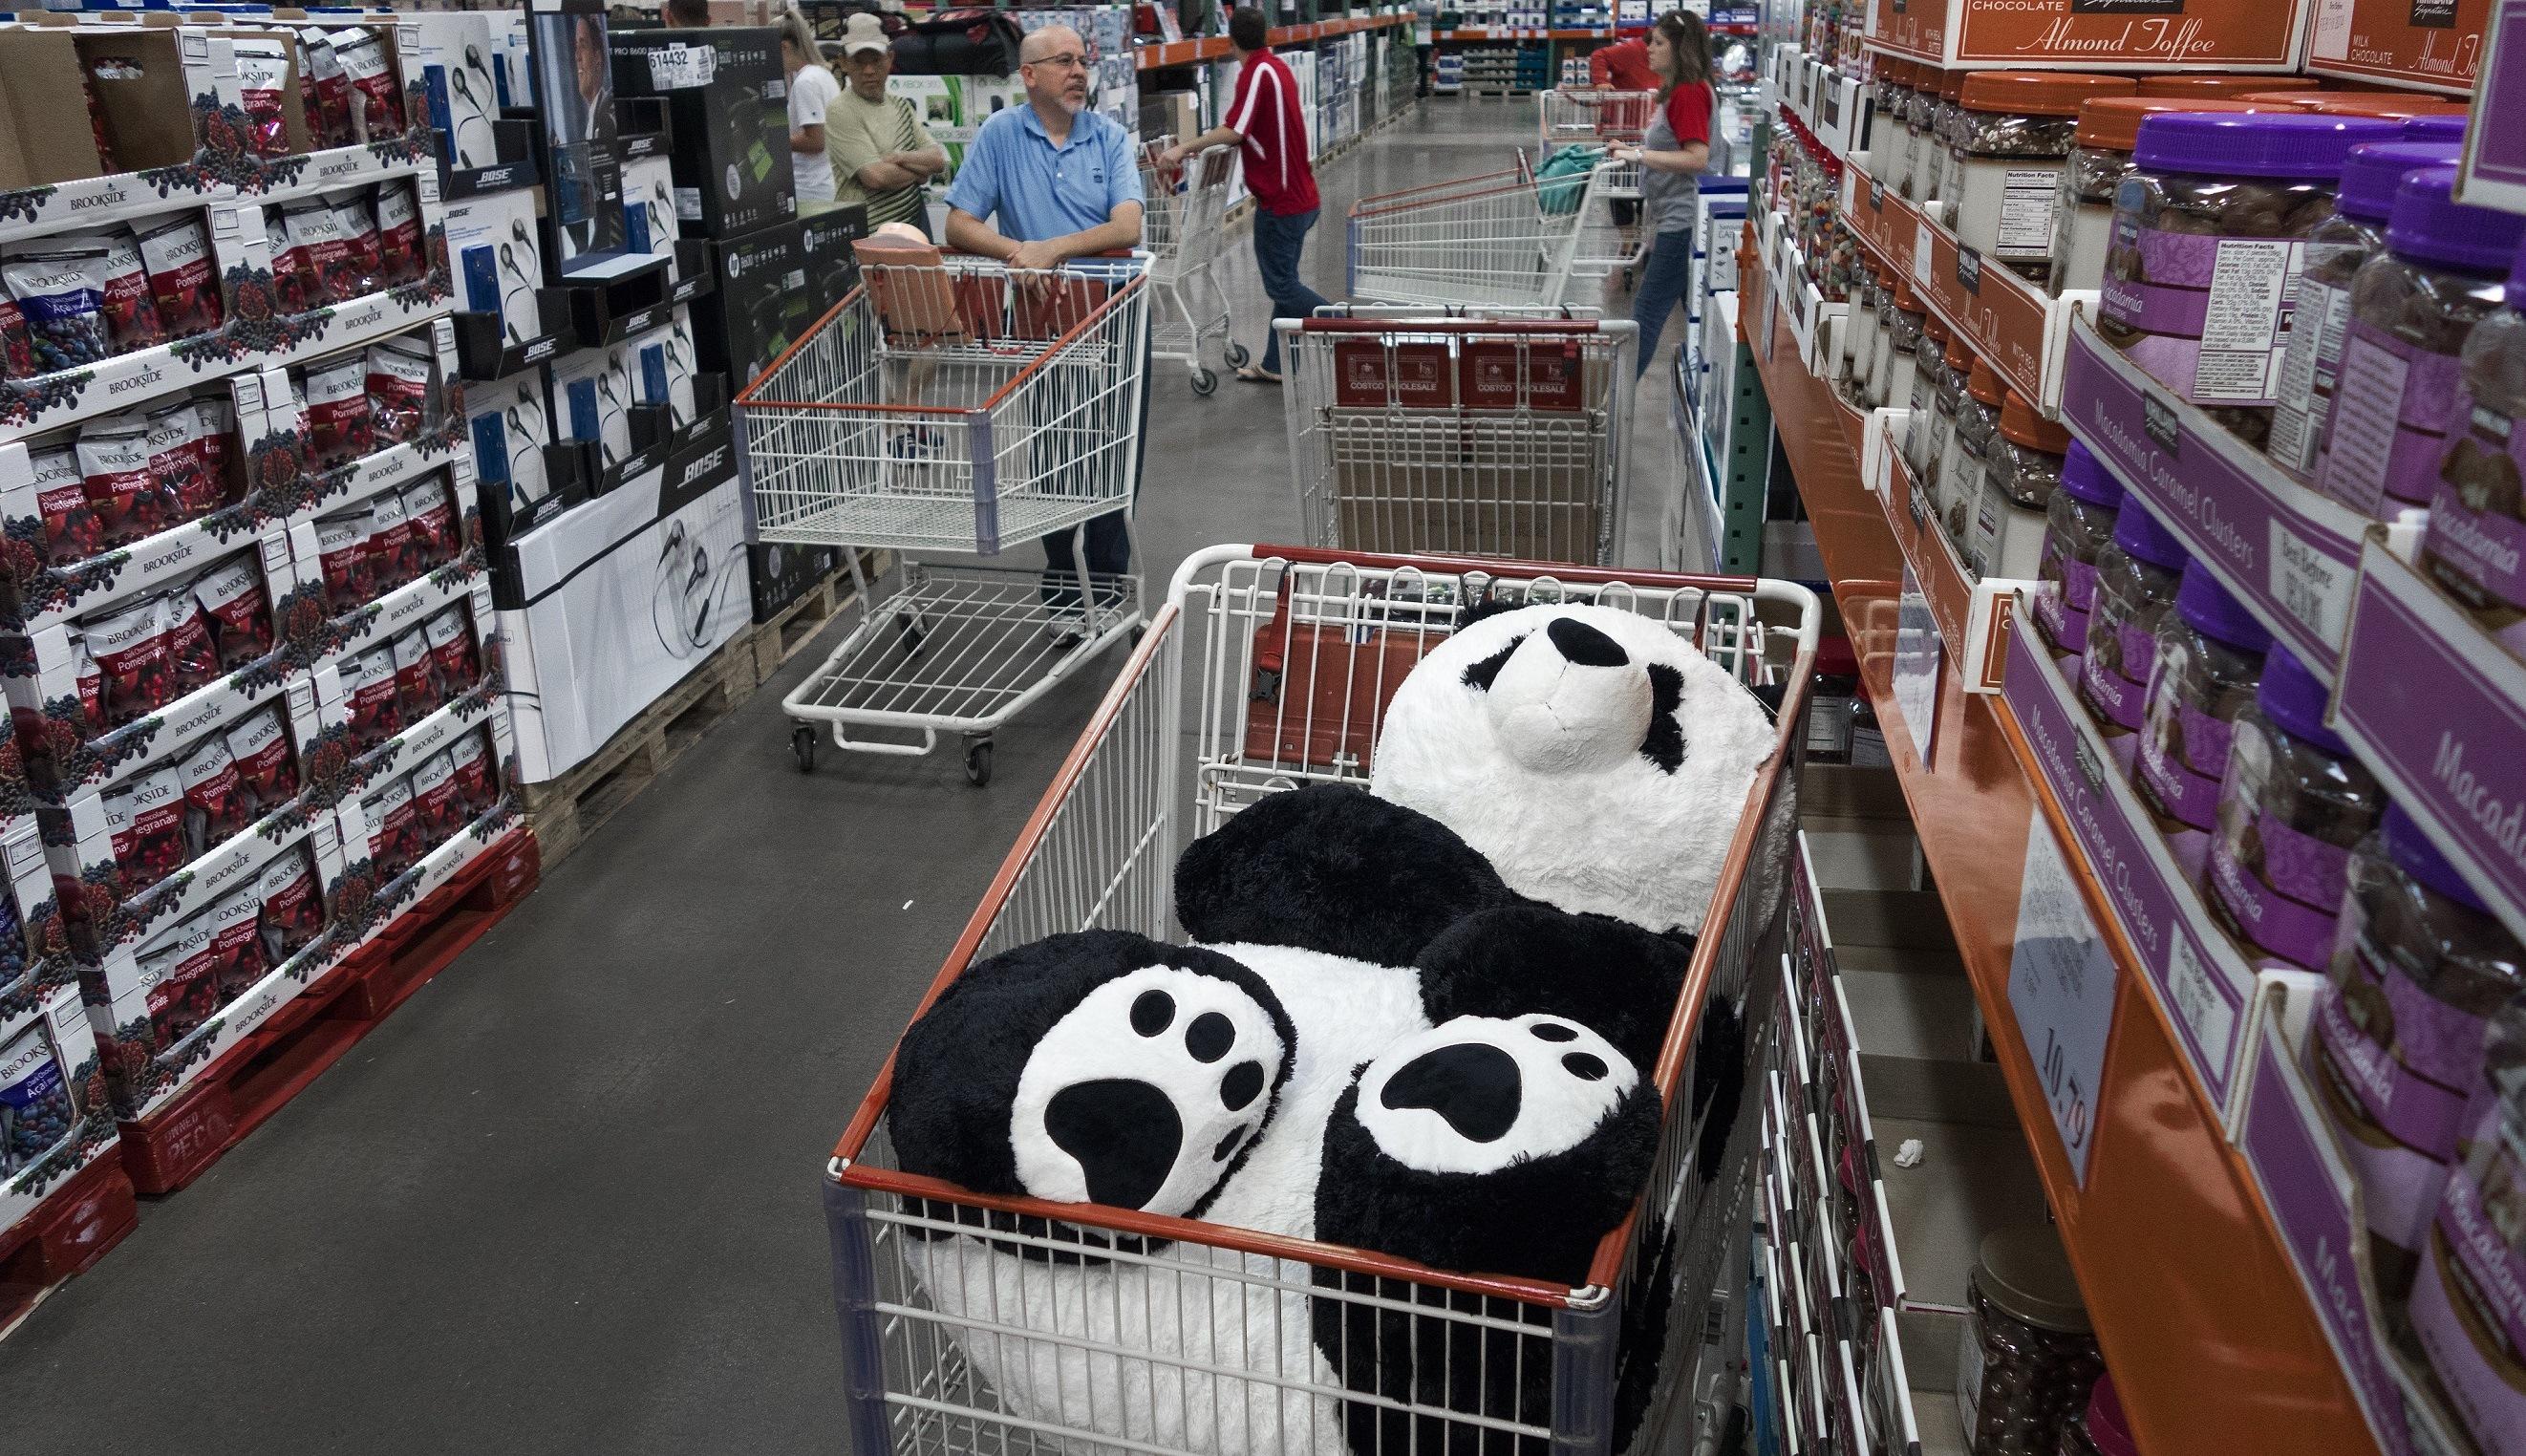 Costco Stuffed animal